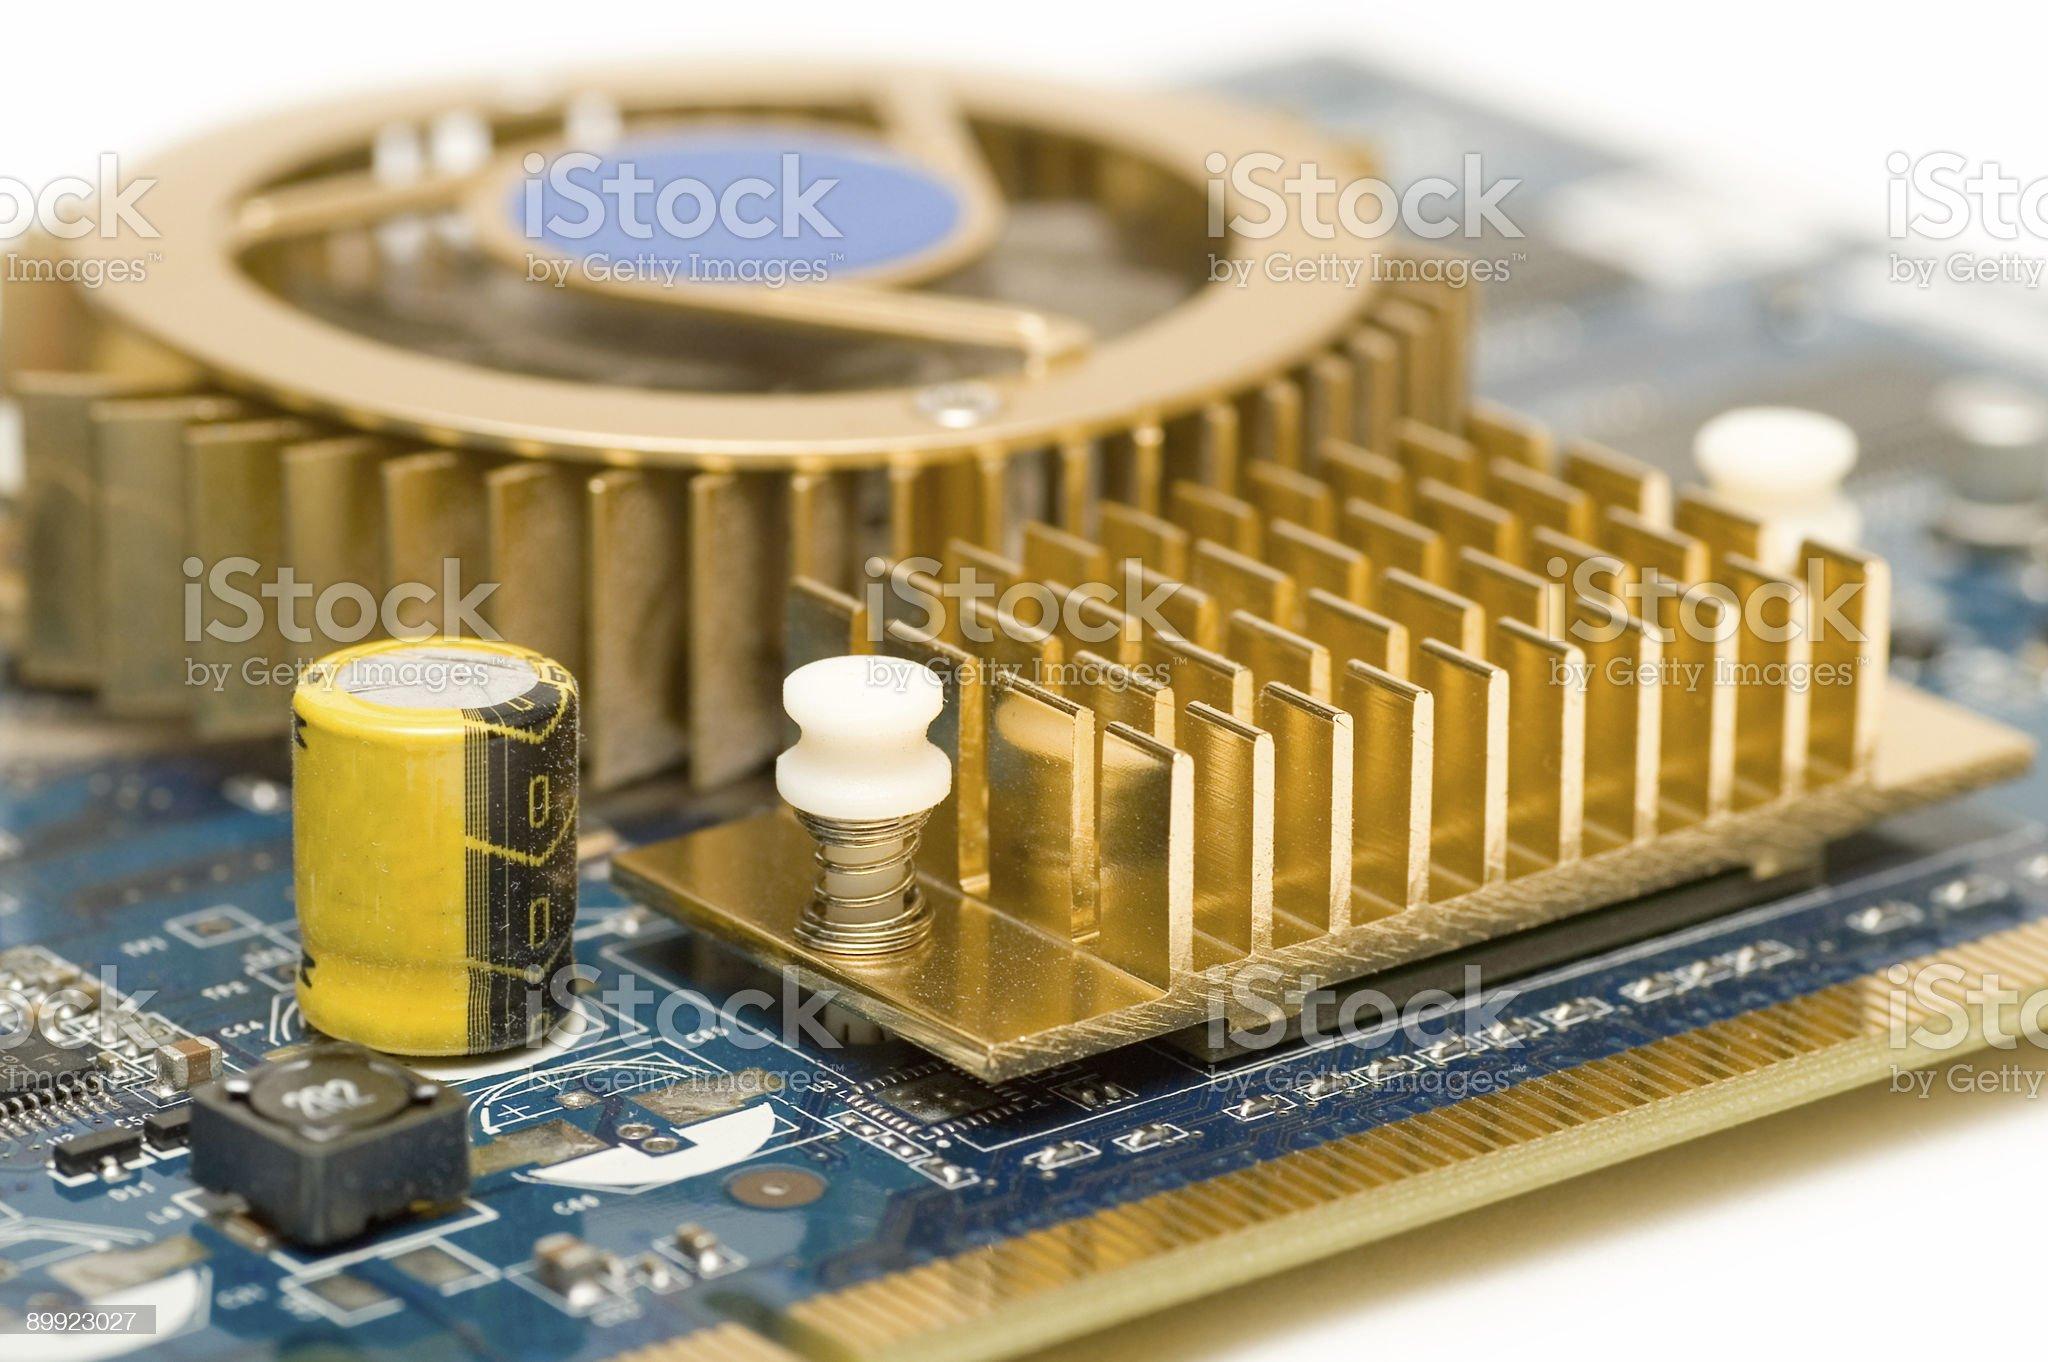 Close-up Of Heatsink royalty-free stock photo